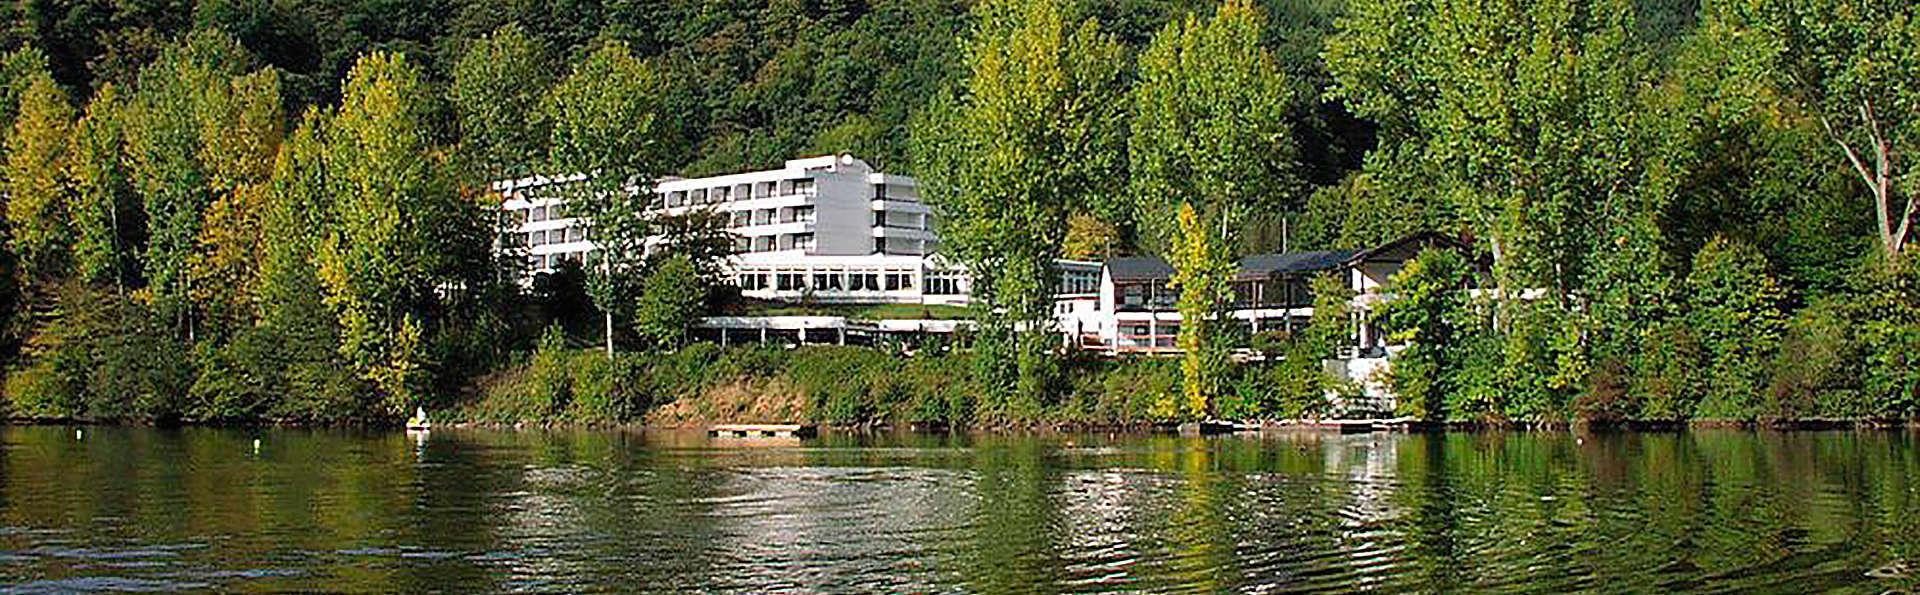 Dorint Seehotel & Resort Bitburg Südeifel - edit_landscape.jpg